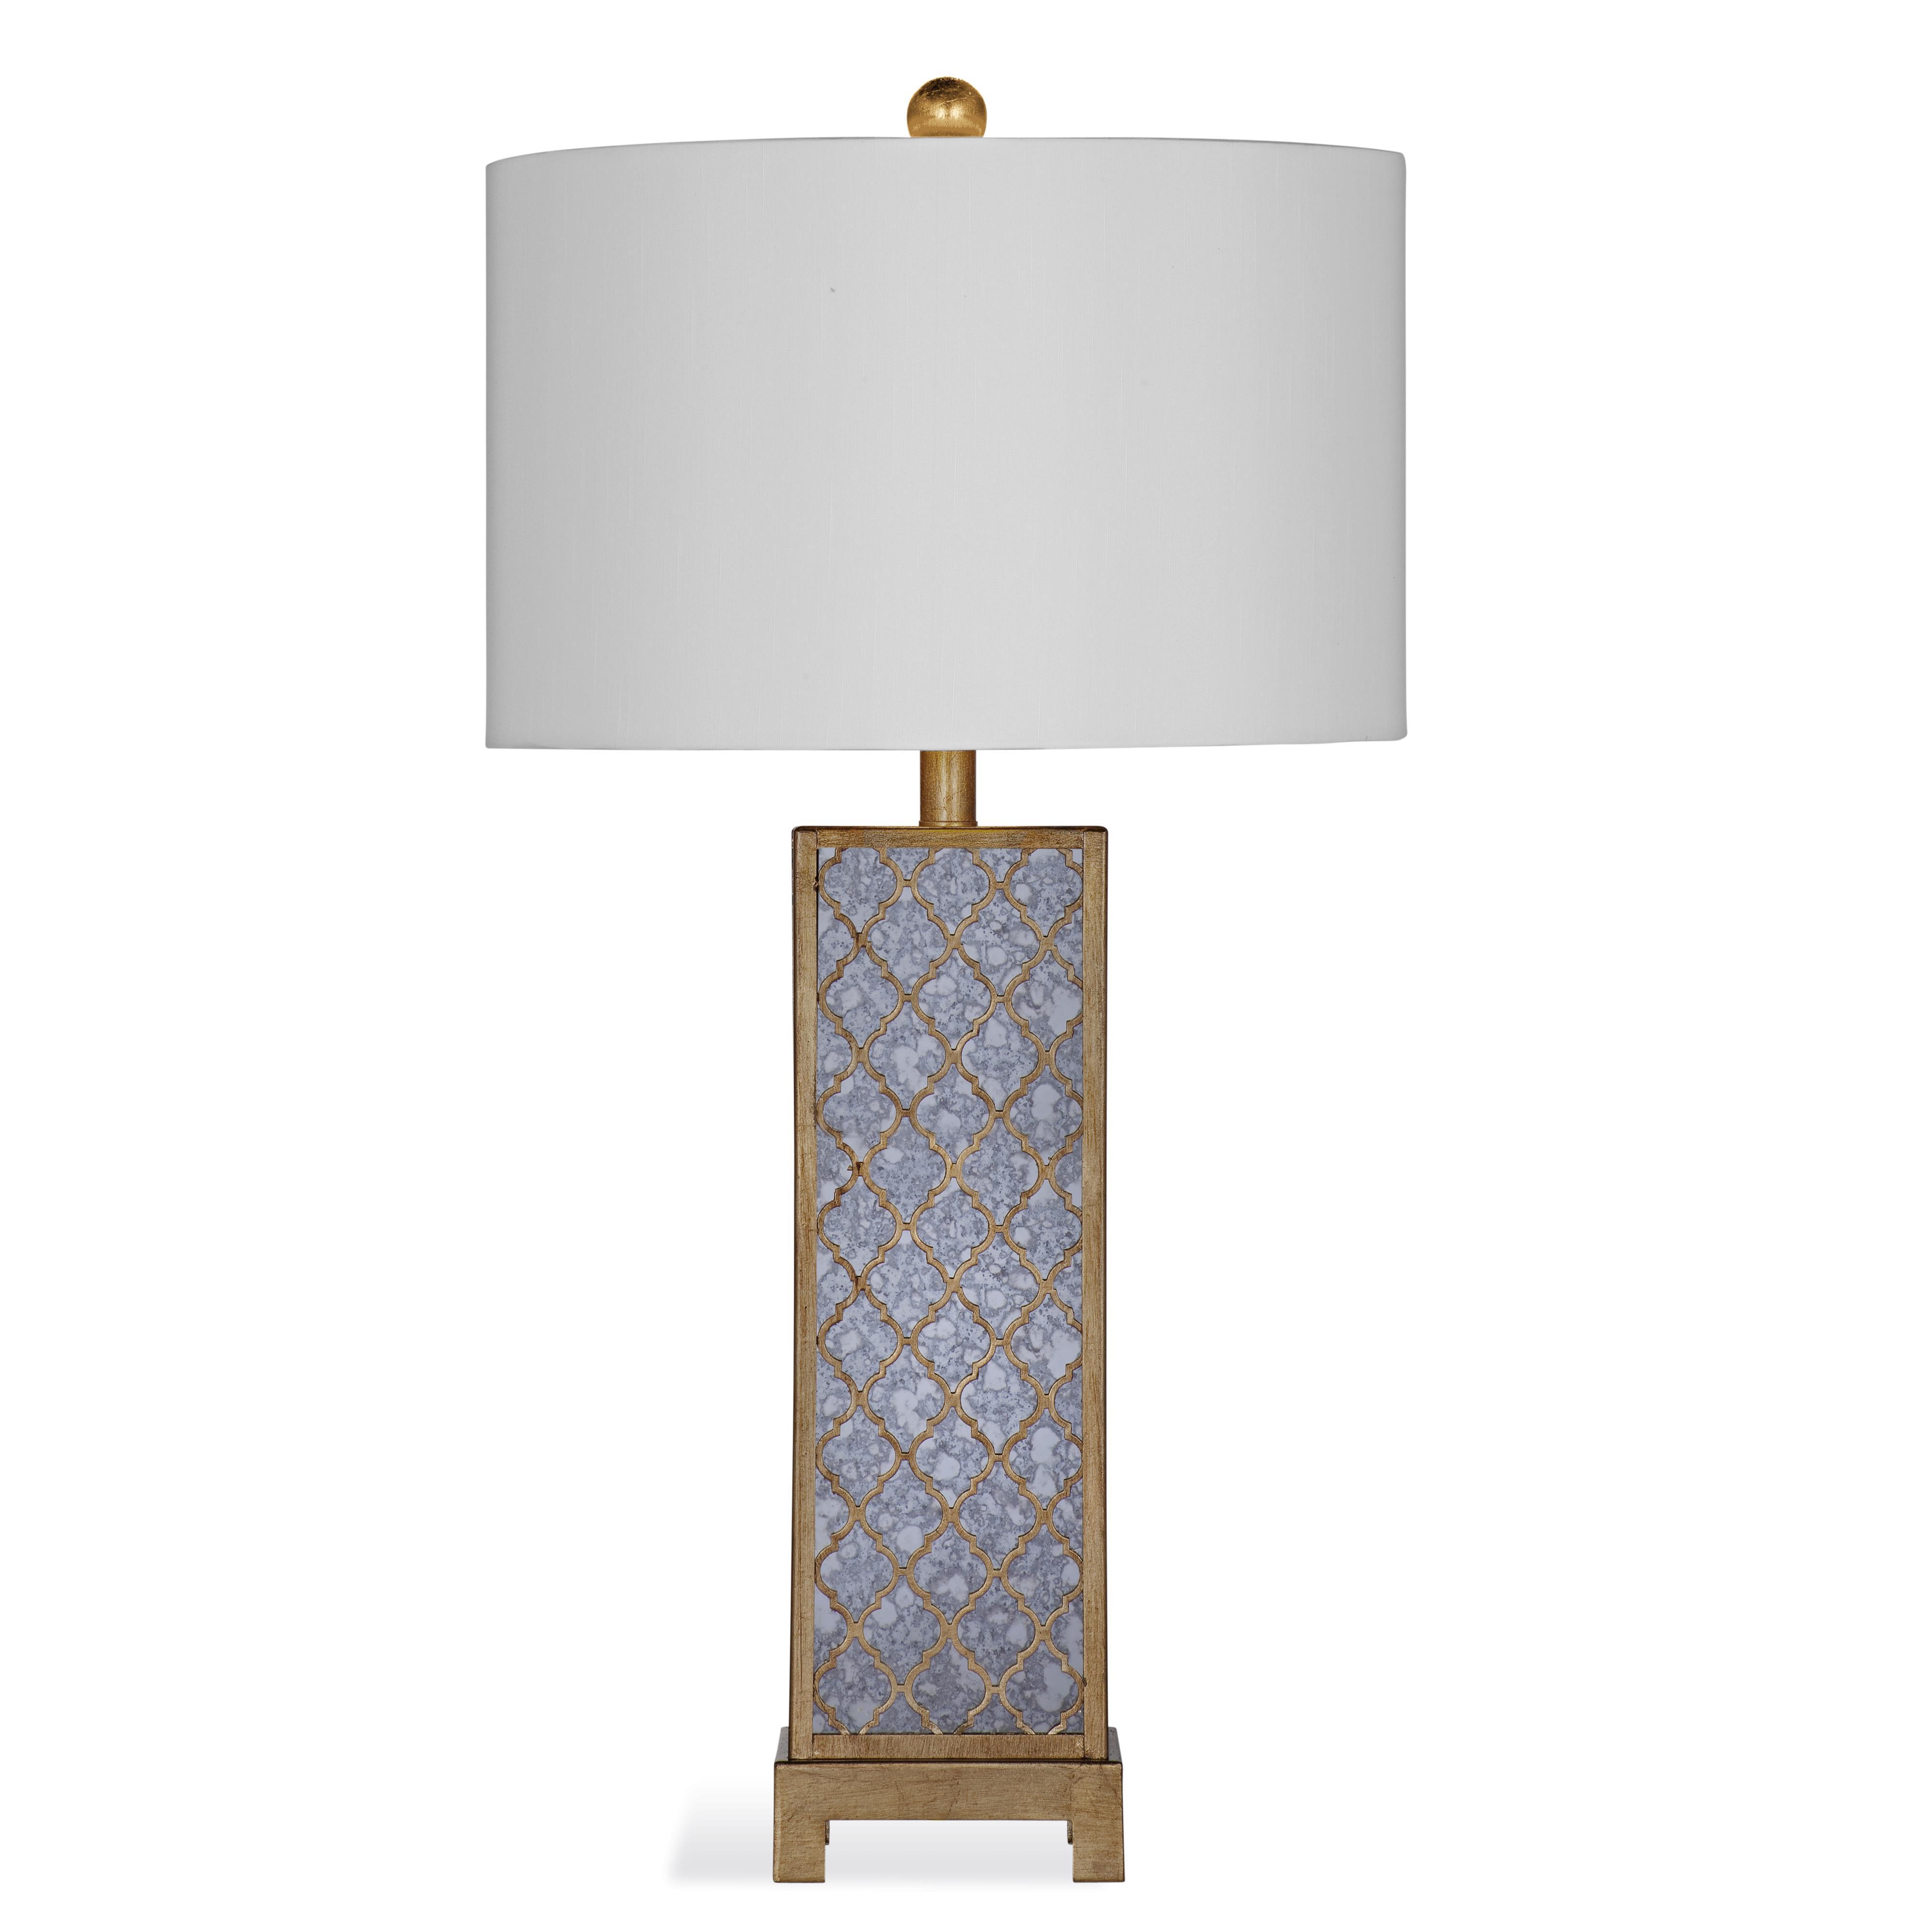 Thoroughly Modern Baskin Table Lamp by Bassett Mirror at Alison Craig Home Furnishings